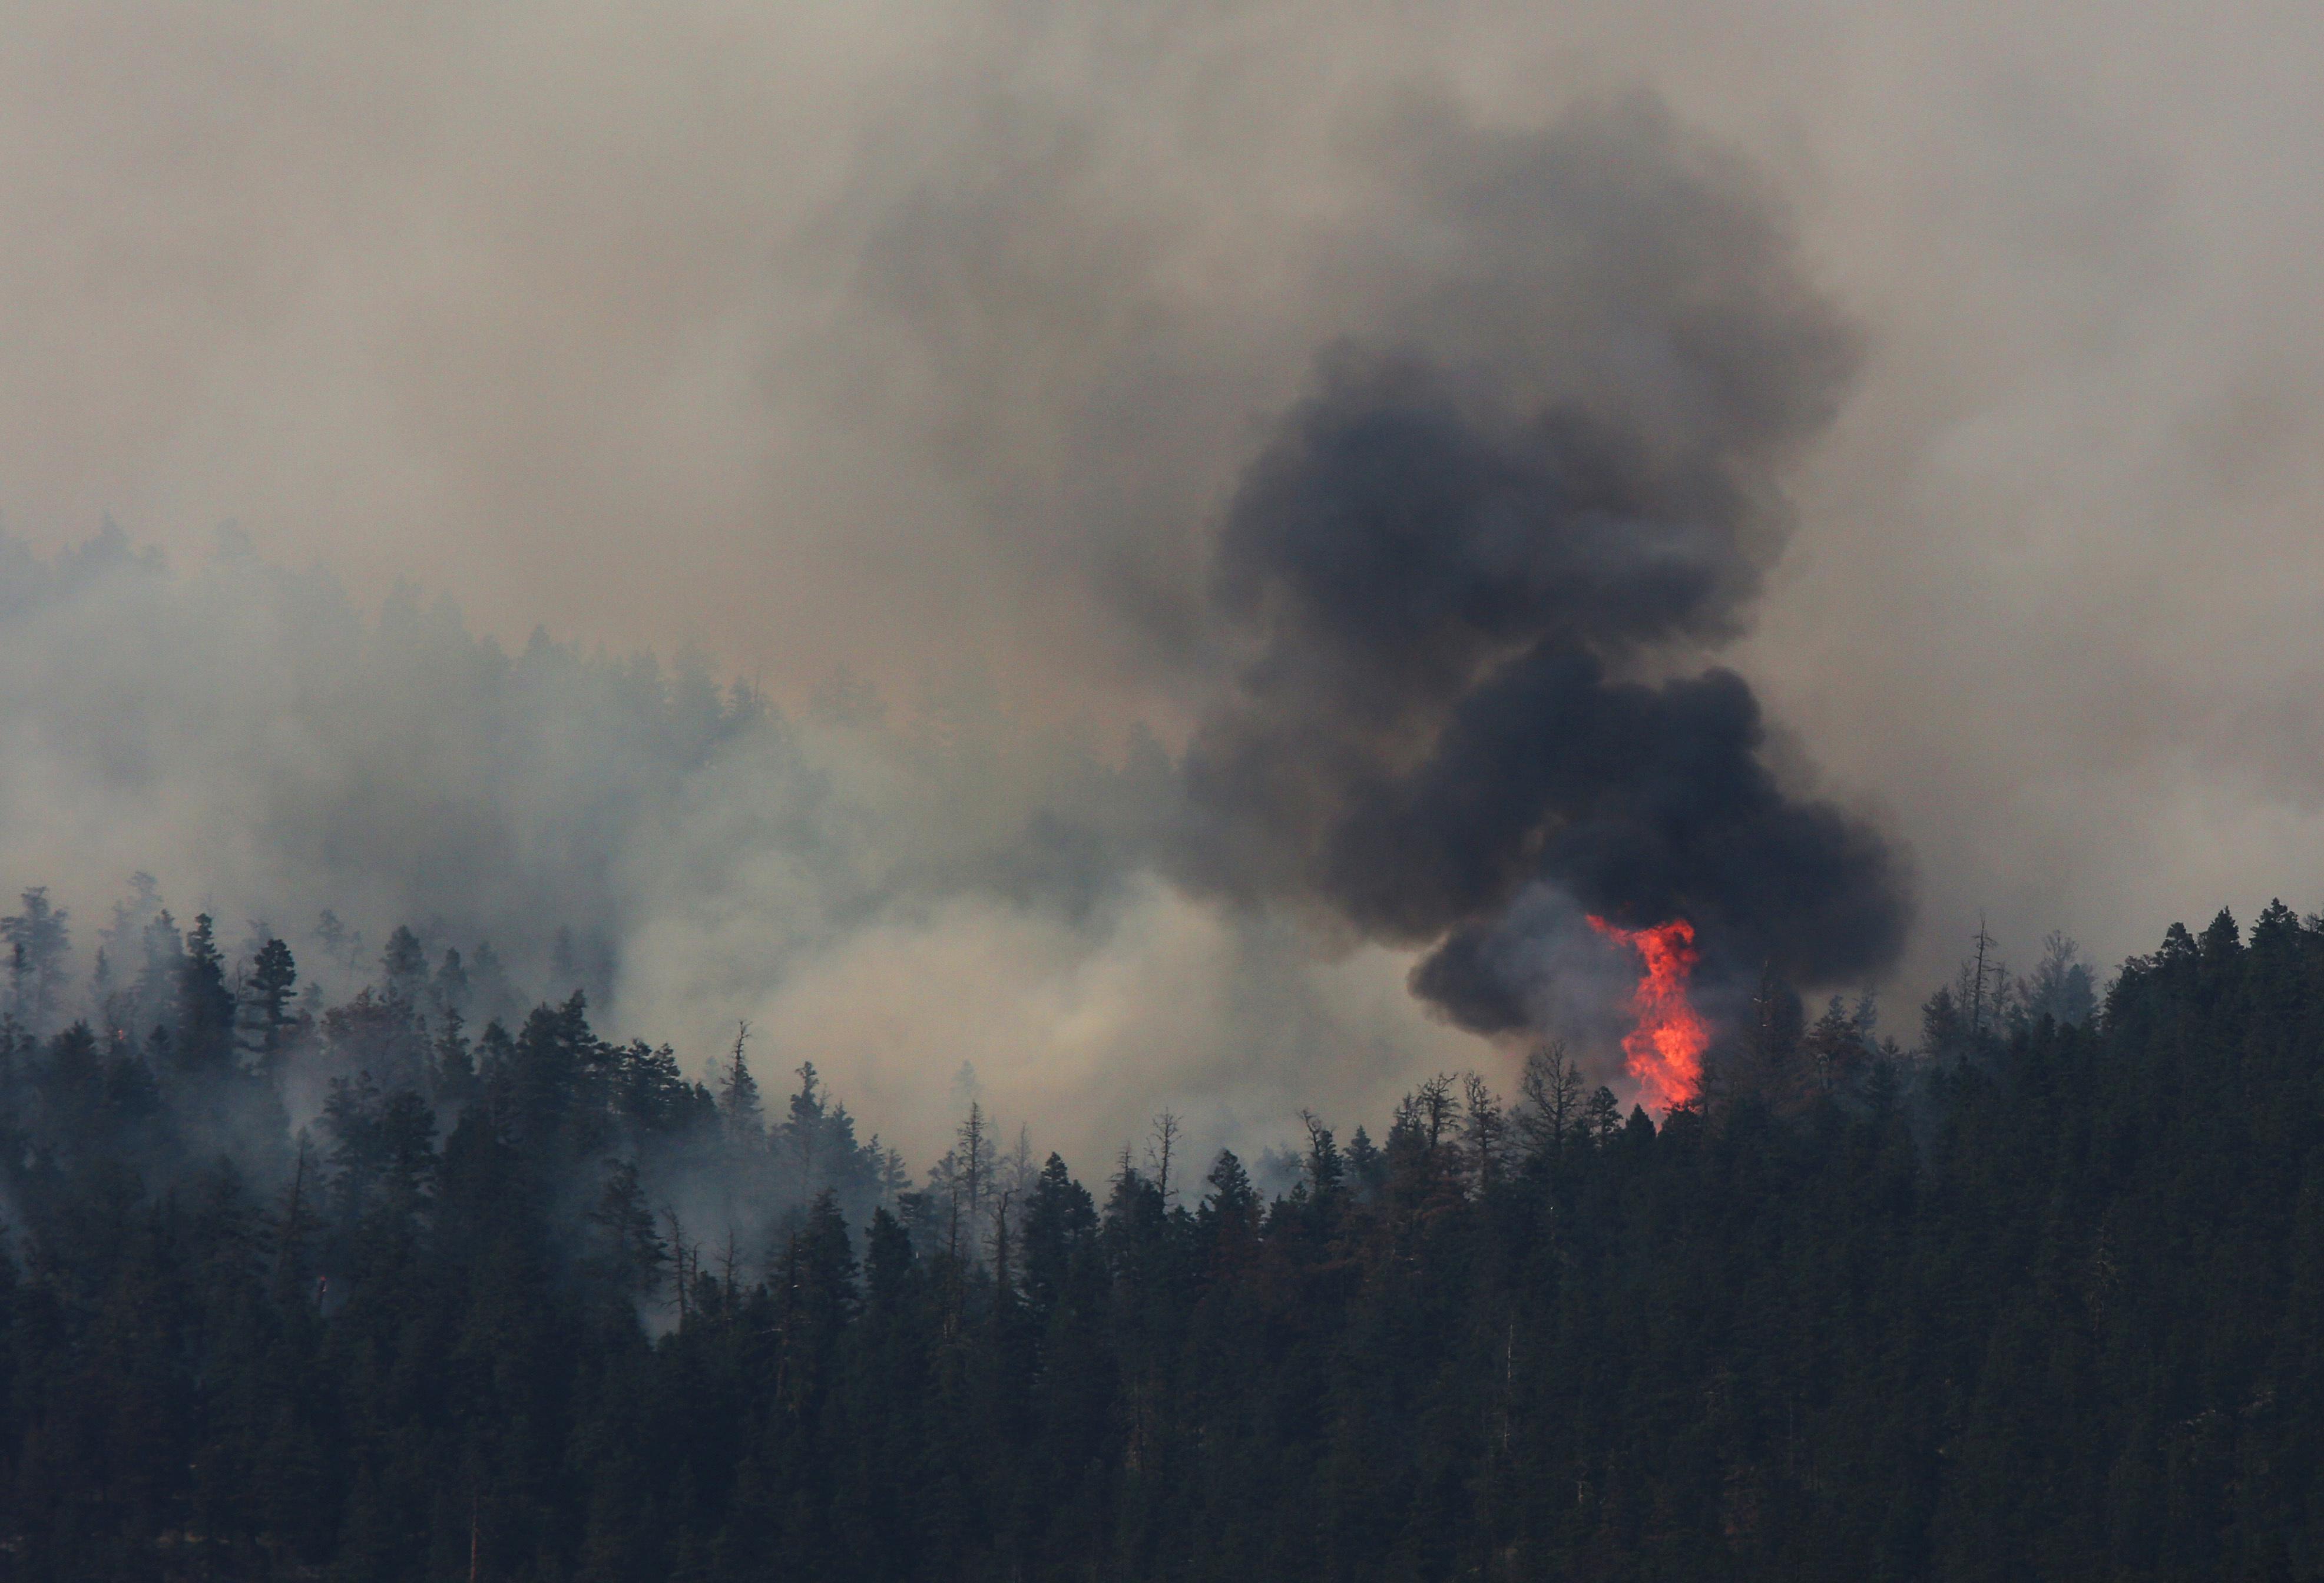 Banff National Park Wildfire Prompts Sunshine Village Guests To Leave Resort